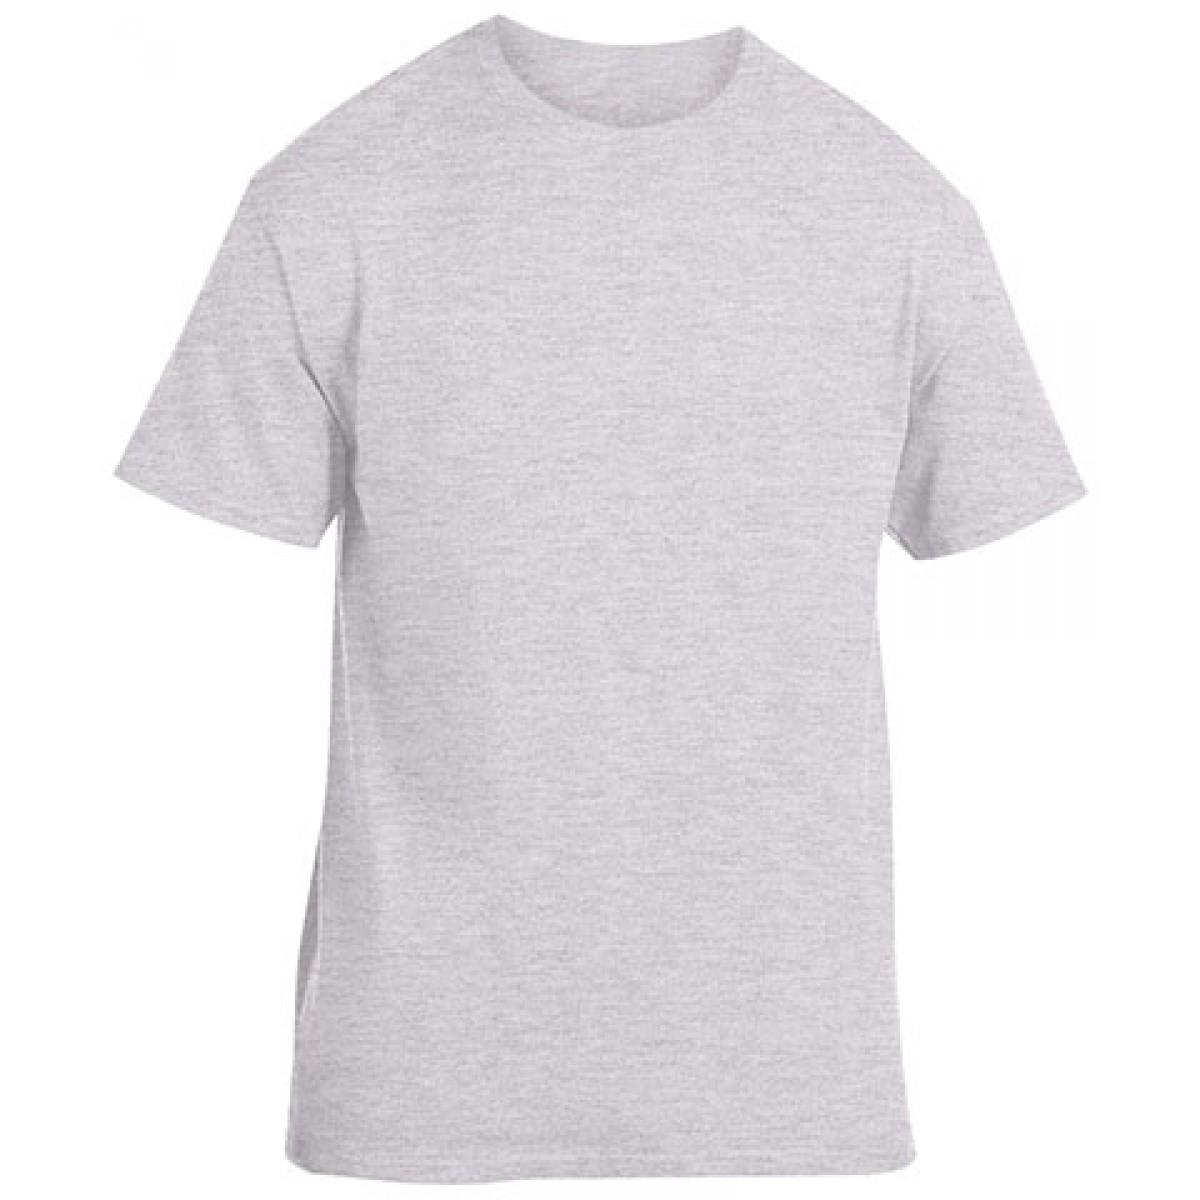 Heavy Cotton Activewear T-Shirt-Sports Grey-XL